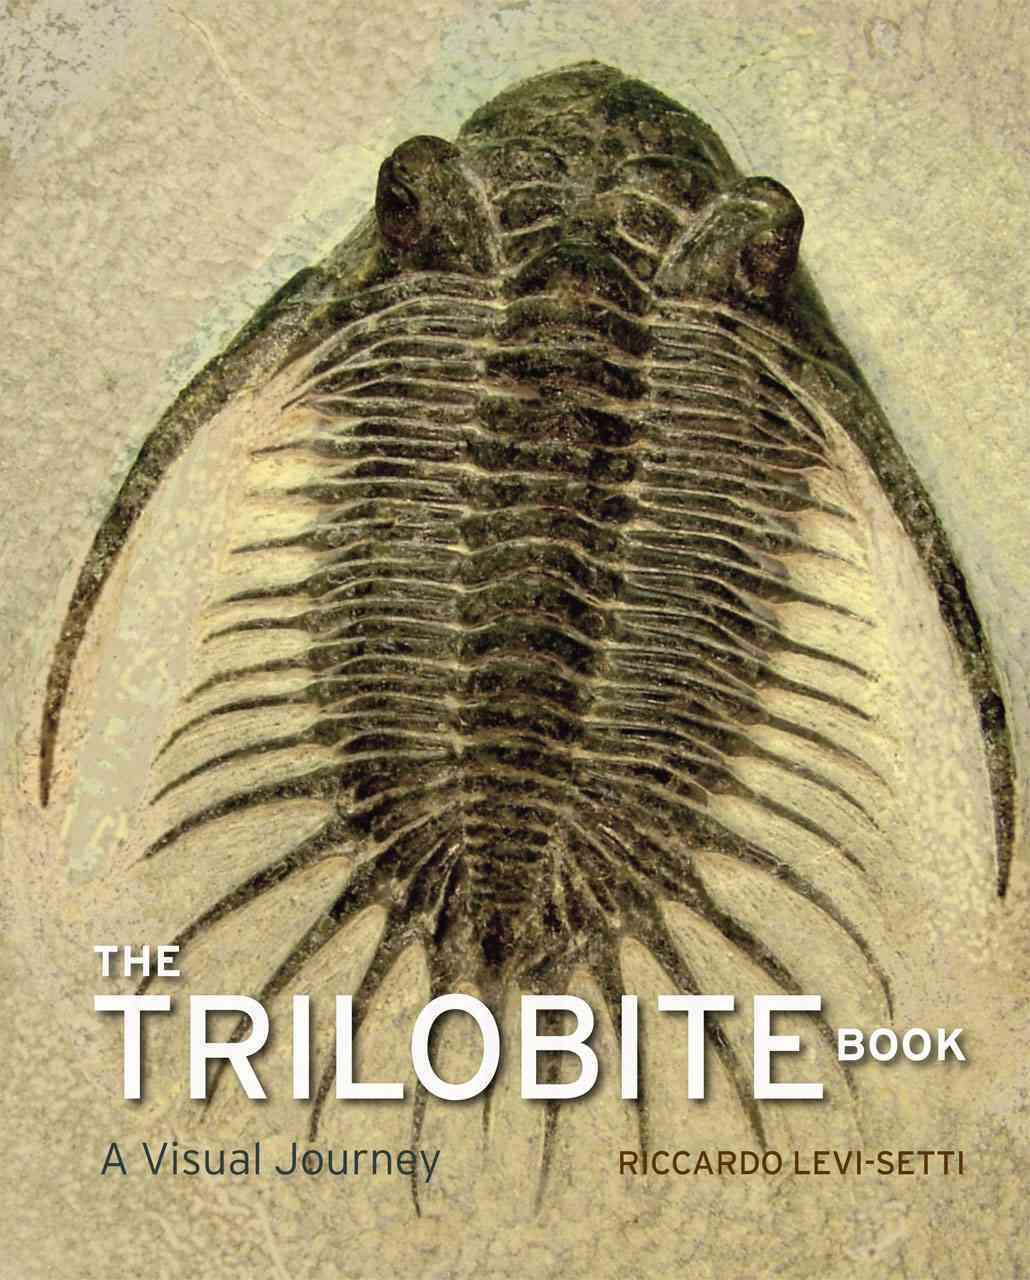 The Trilobite Book By Levi-Setti, Riccardo